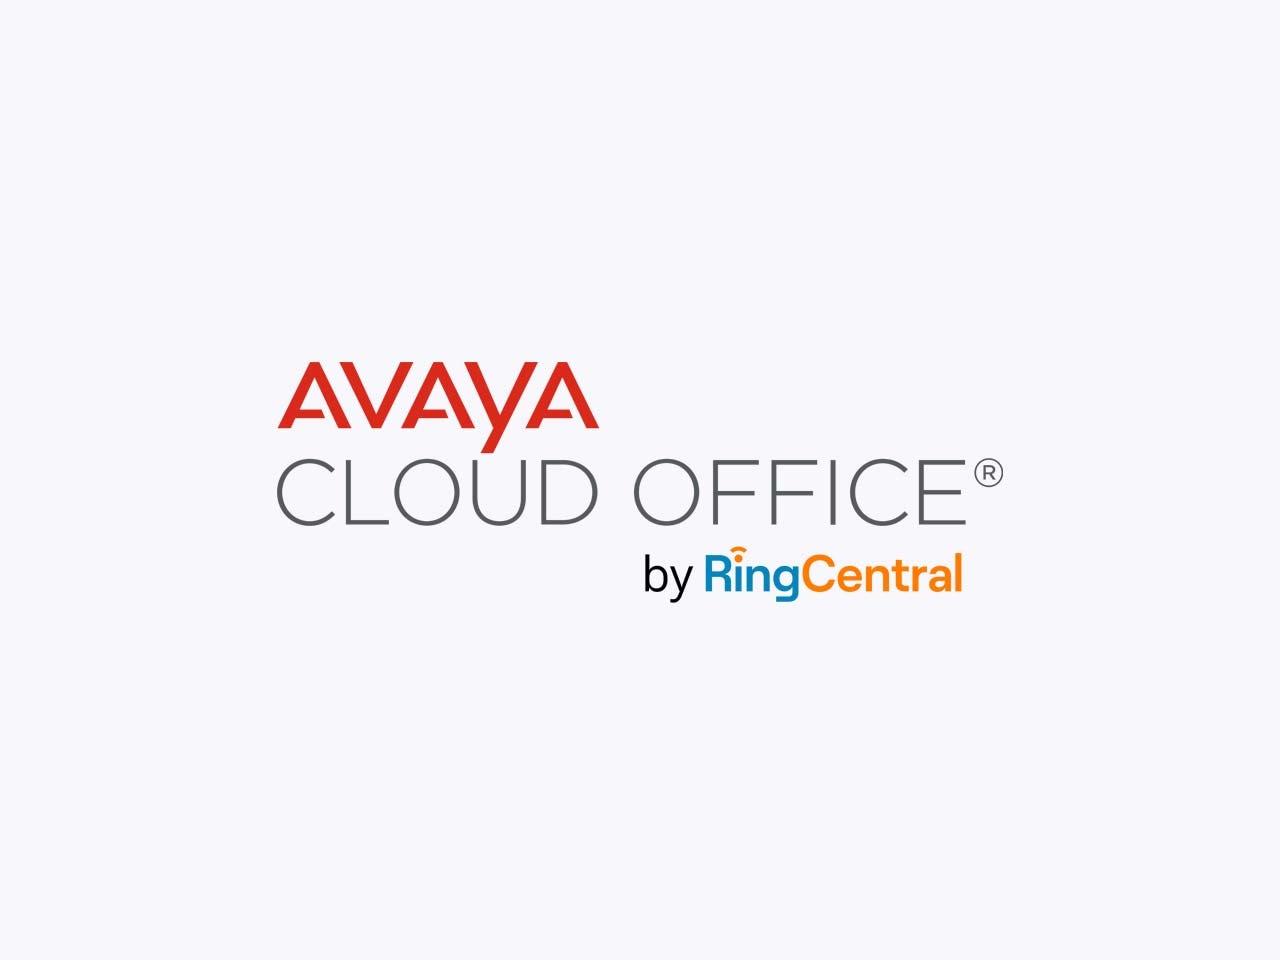 Avaya Cloud Office® by RingCentral Logo